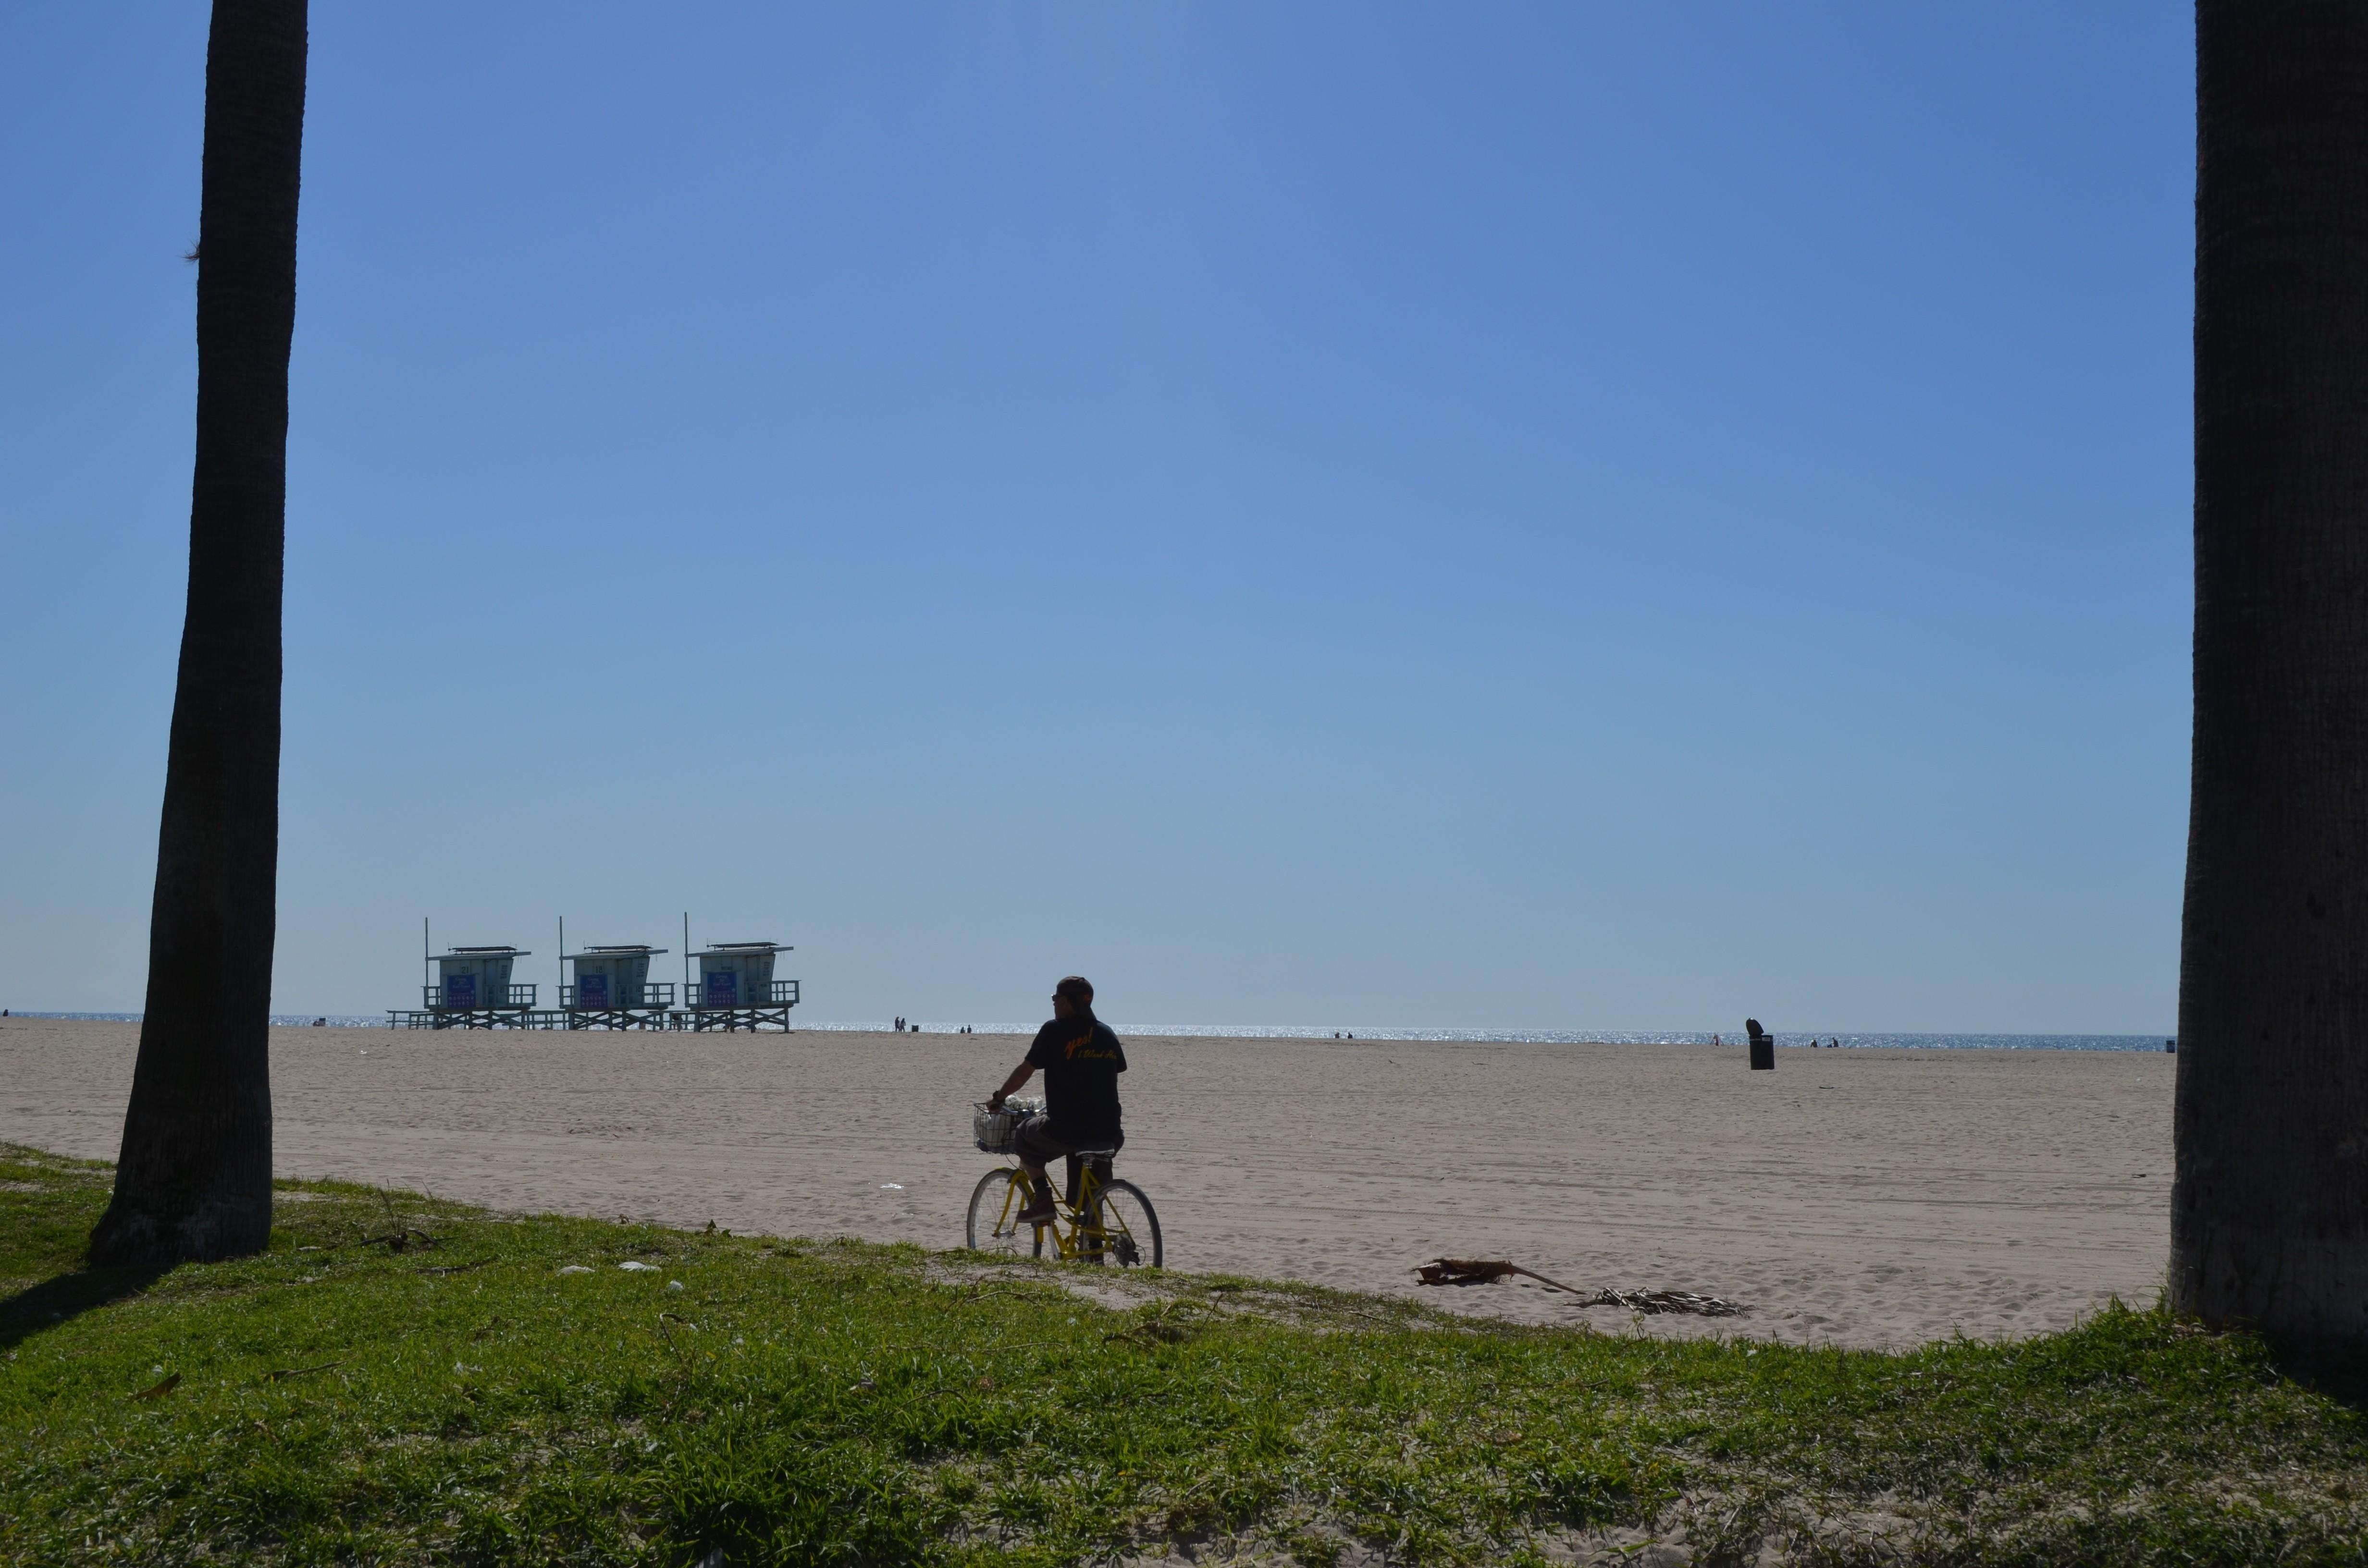 Venice Beach Fahrrad fahren.JPG